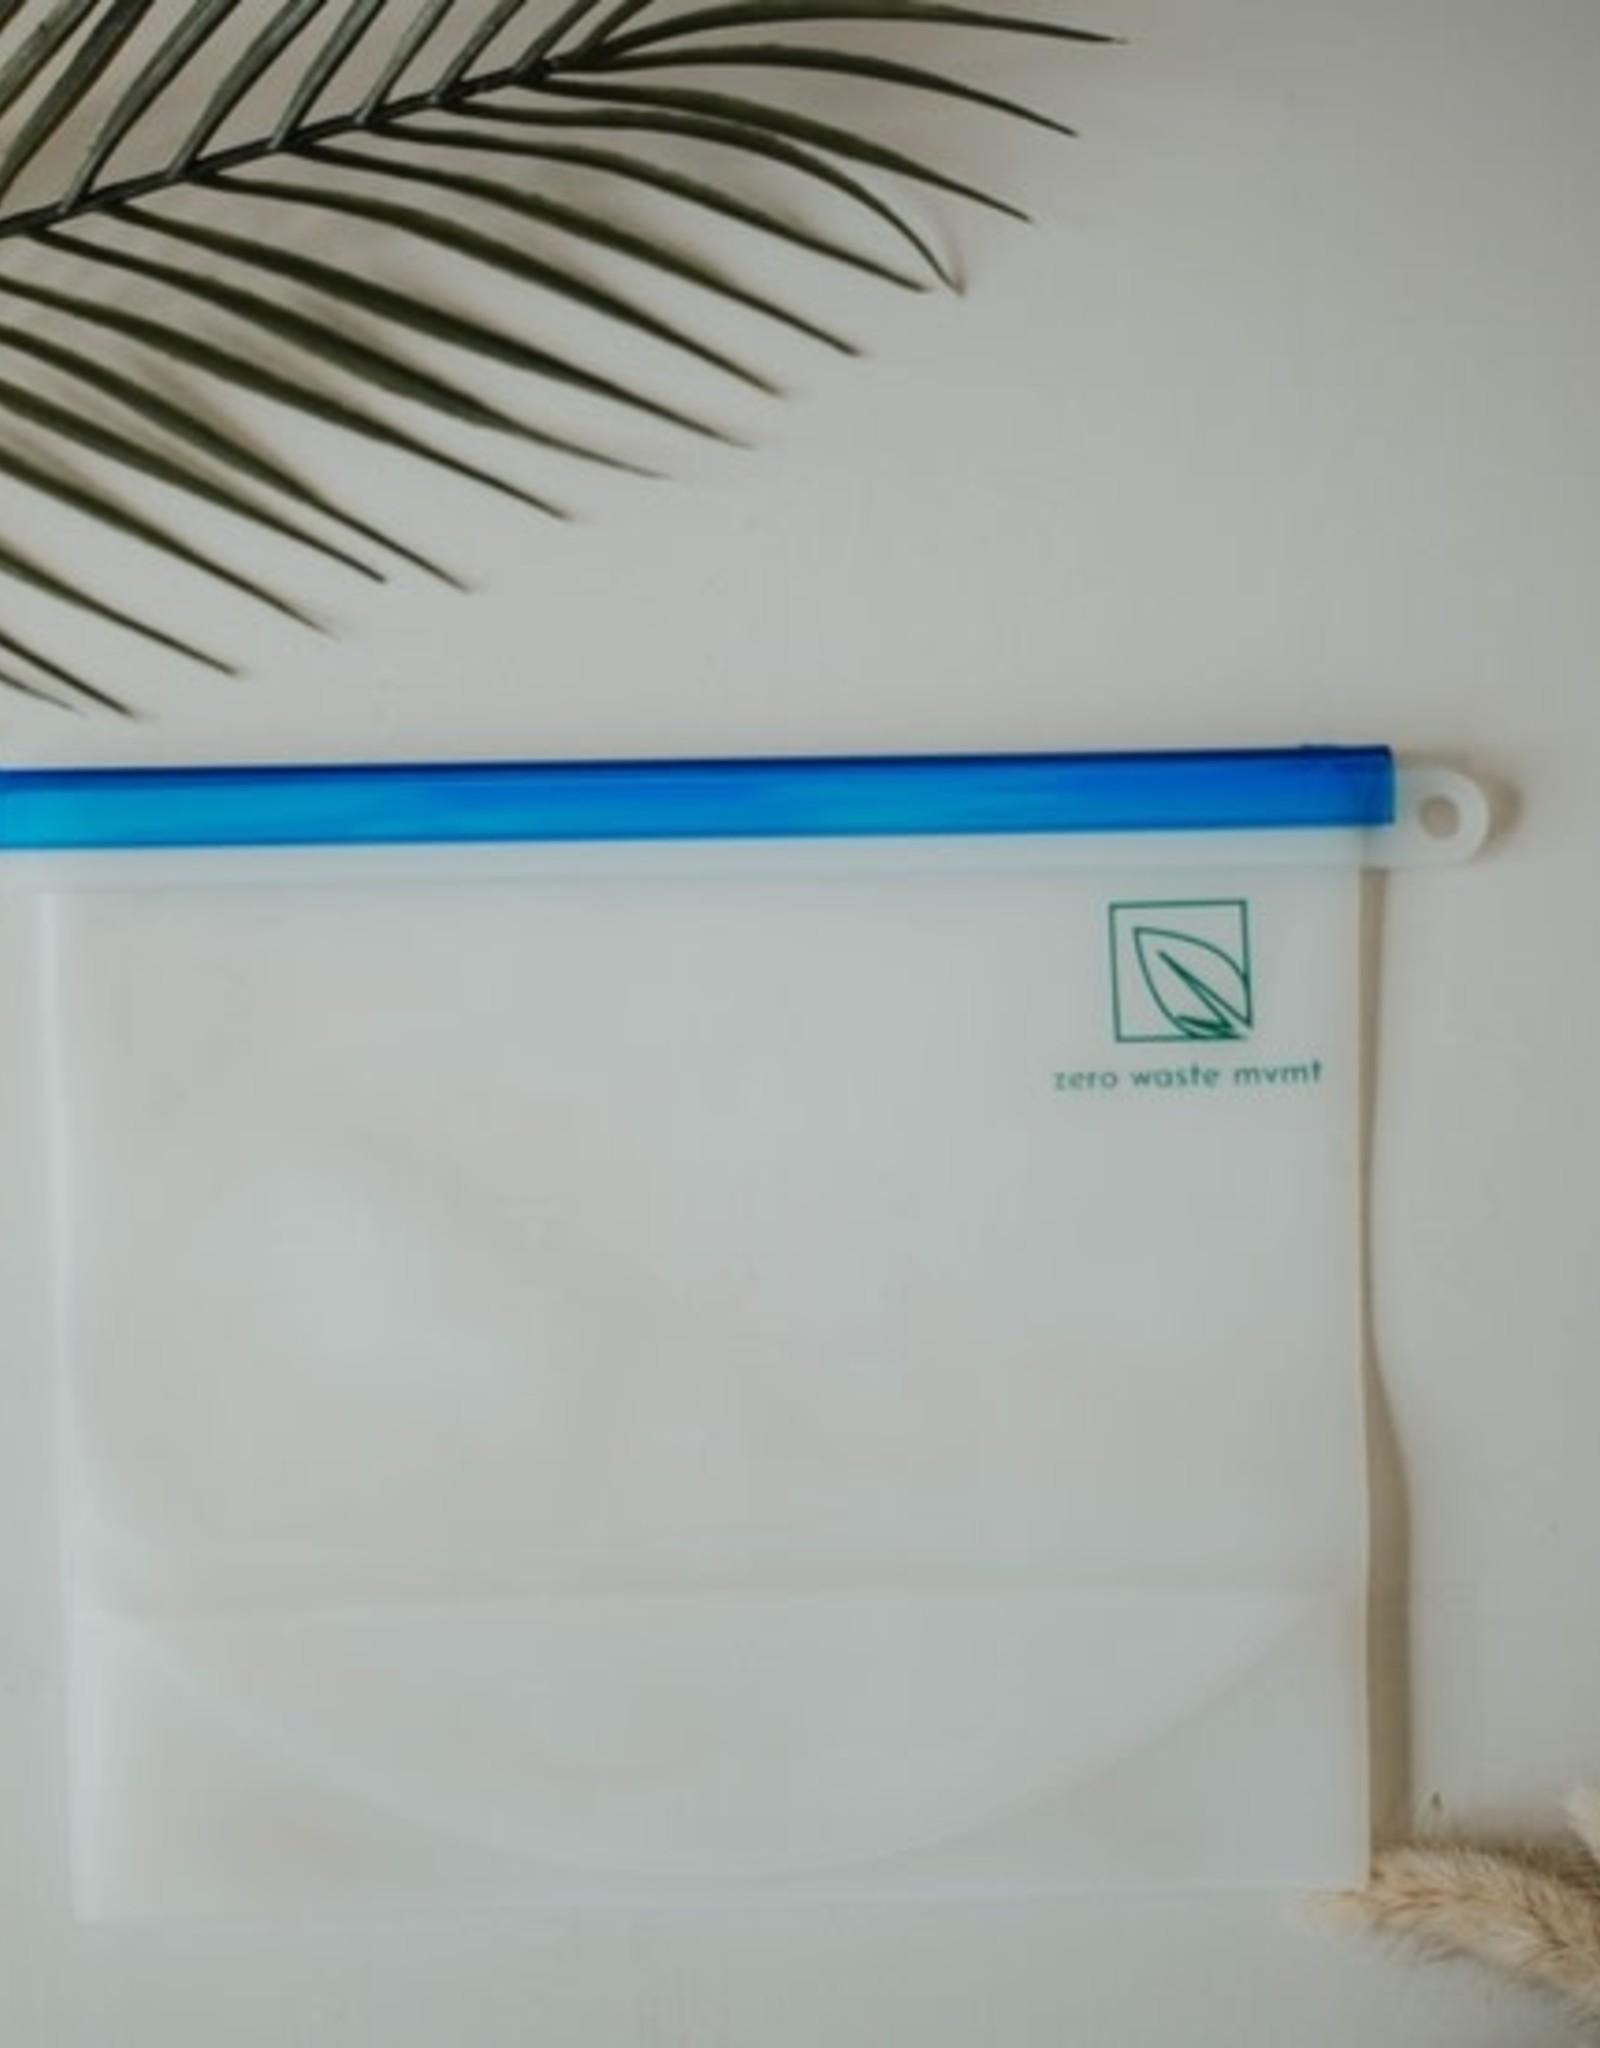 Zero Waste MVMT Silicone Food Bag